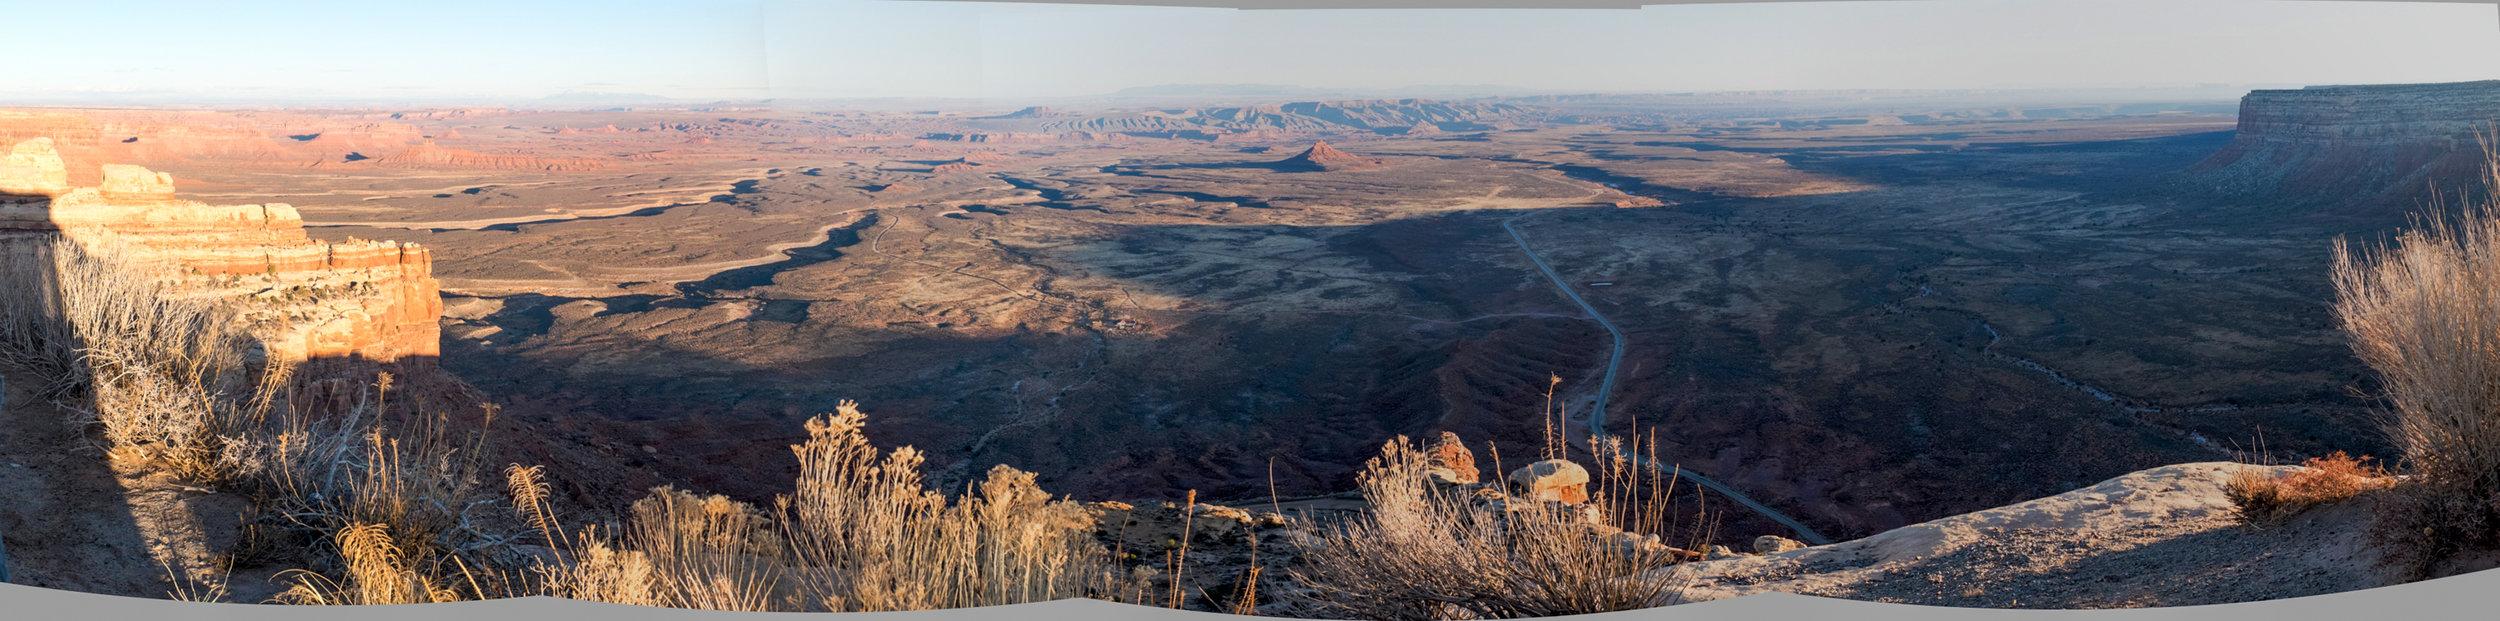 Looking south towards the Navajo Reservation from the top of Cedar Ridge, Utah.